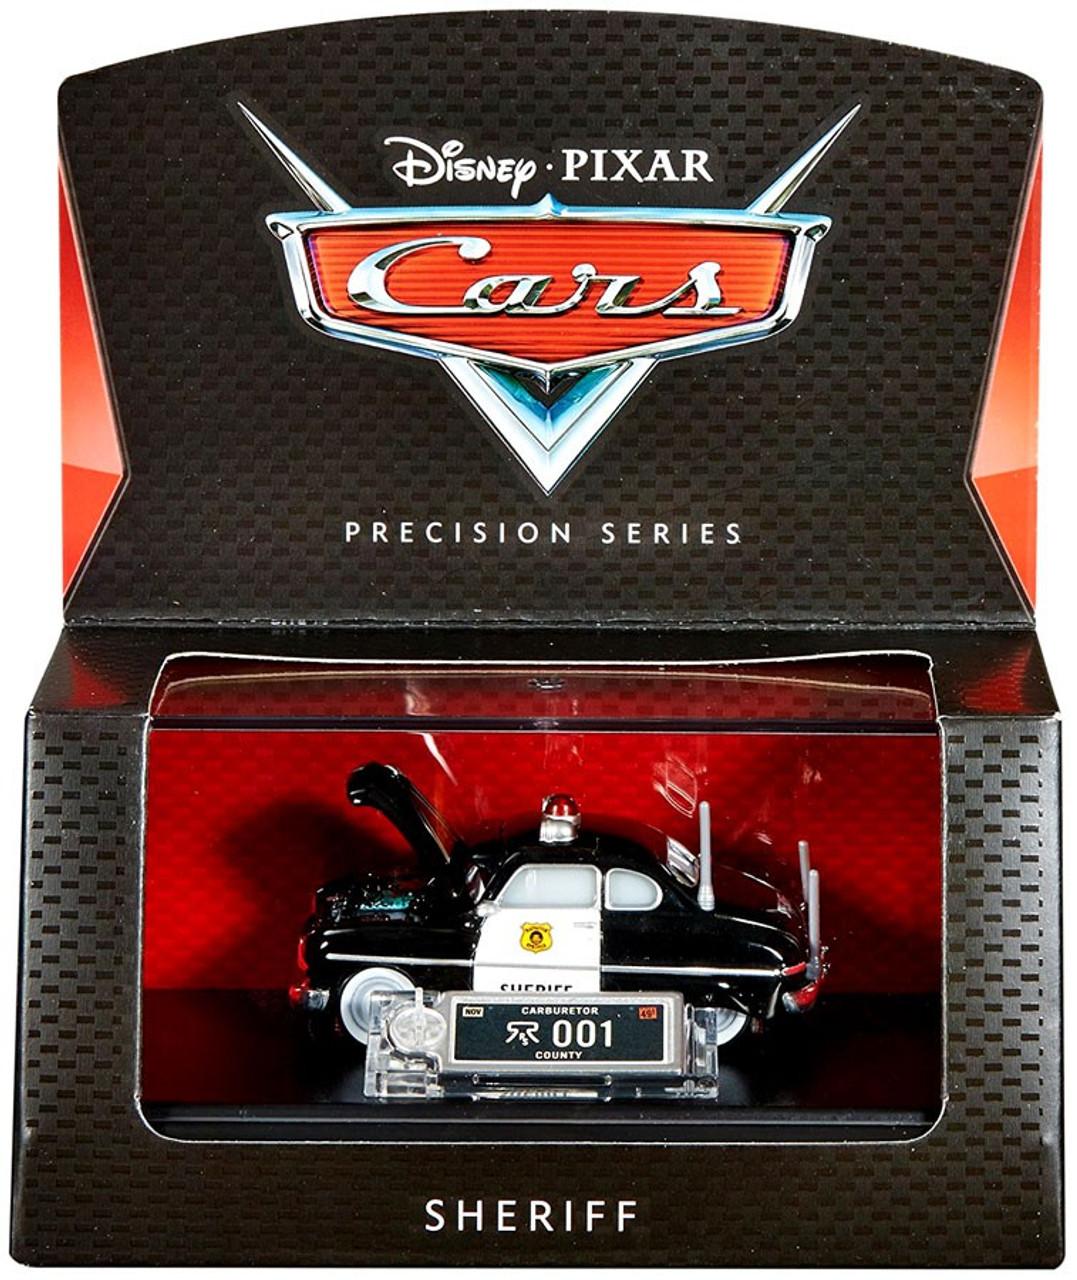 Disney Pixar Cars Precision Series Sheriff 155 Diecast Car Mattel